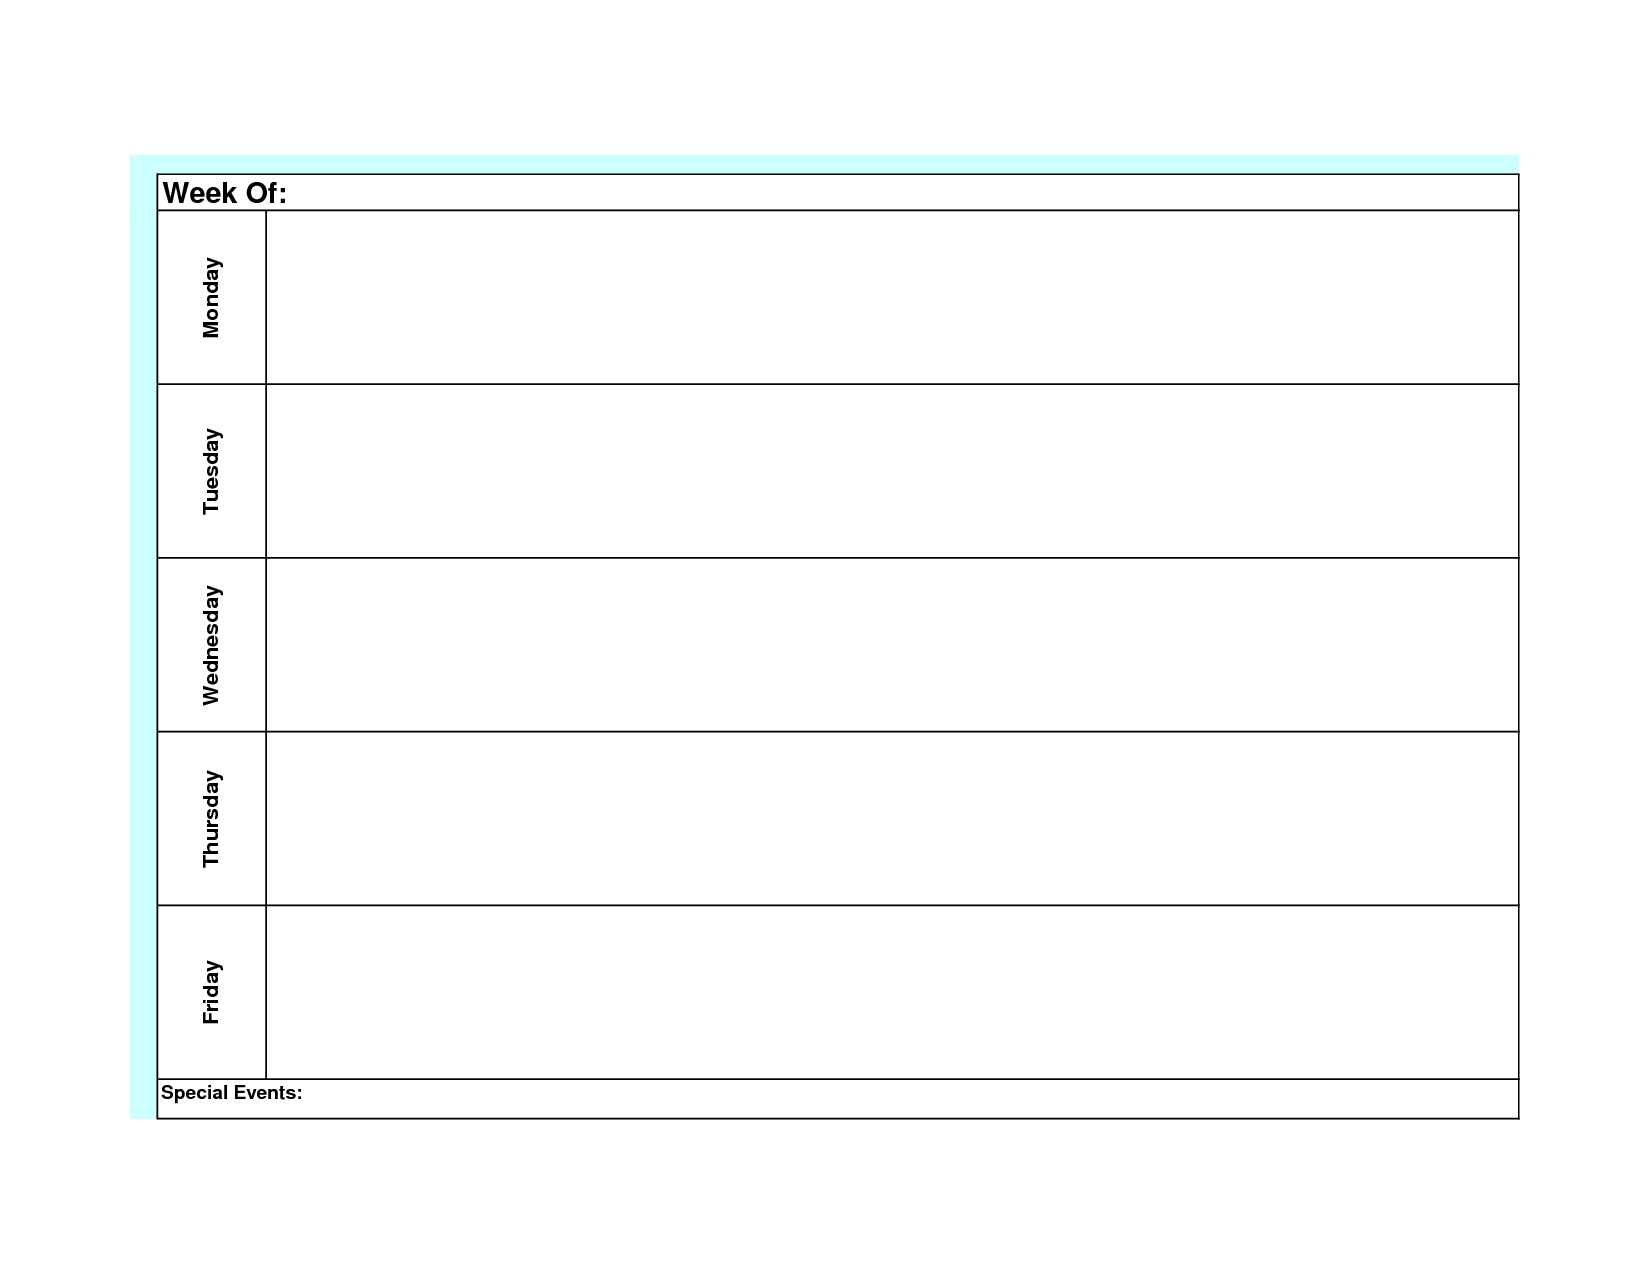 Monday – Friday Diary Template | Calendar Template Printable Free Blank Monday Through Friday Calander